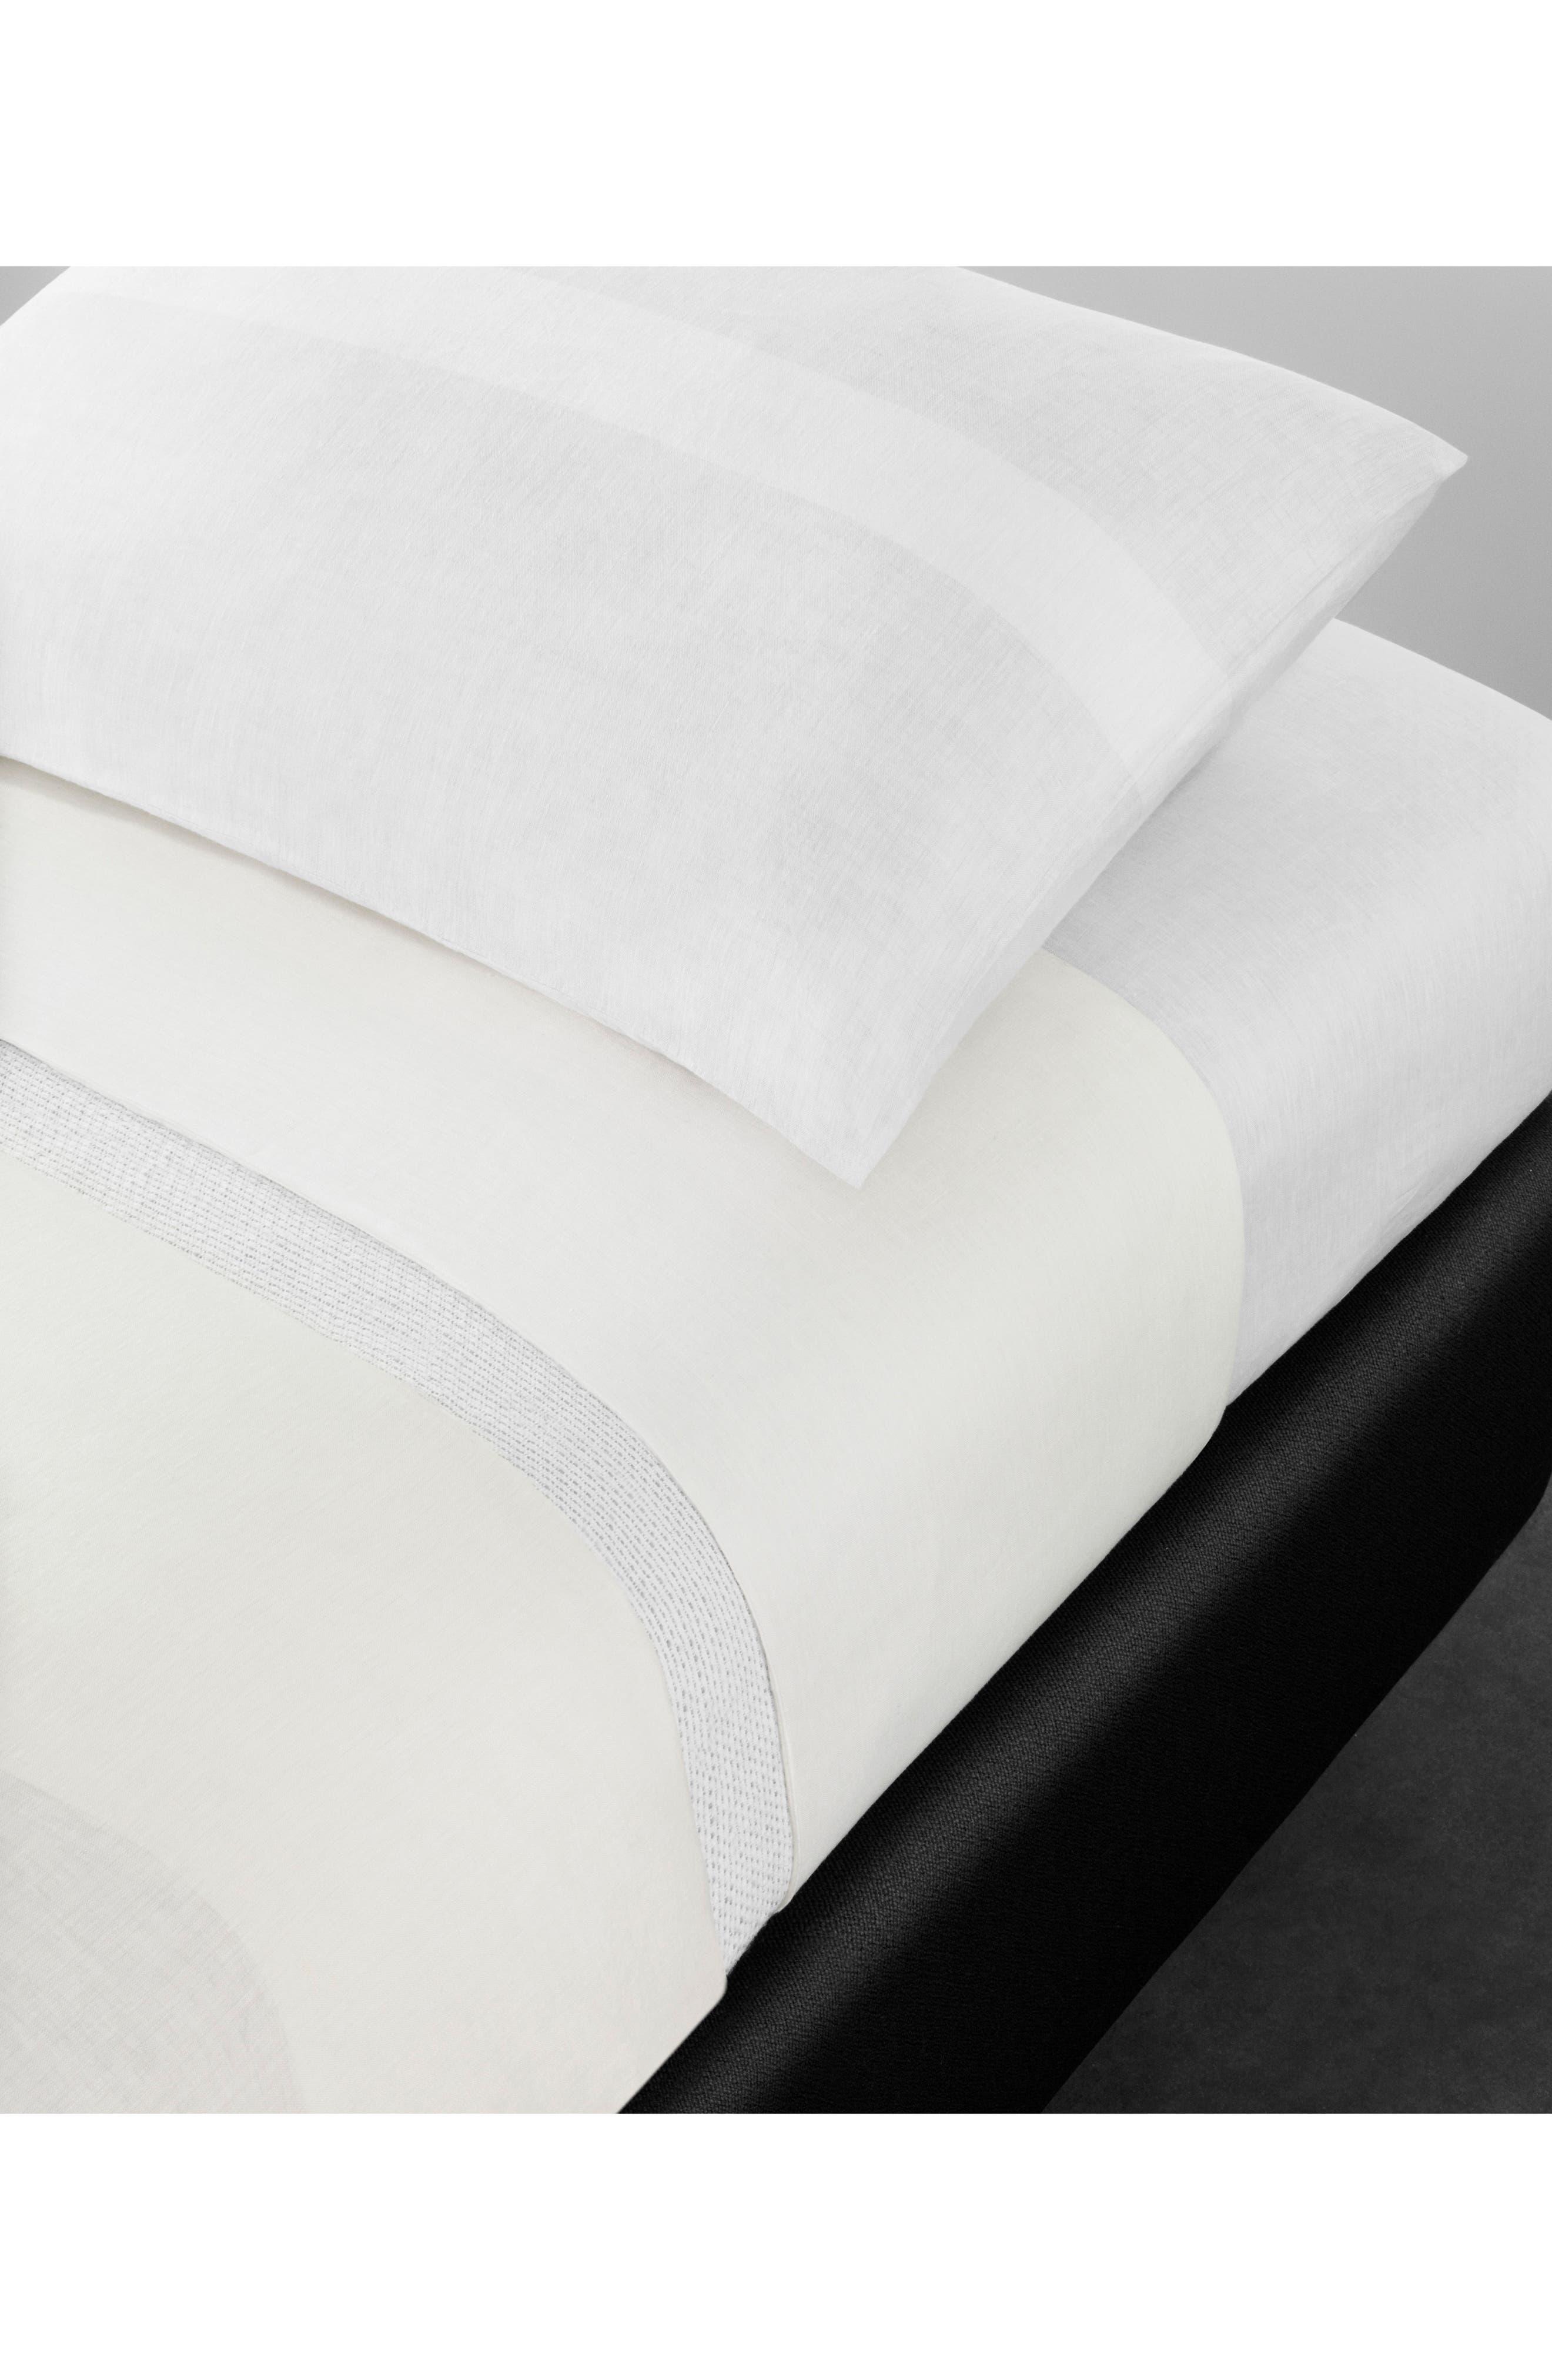 Alternate Image 2  - Calvin Klein Home Solo 580 Thread Count Linen Duvet Cover